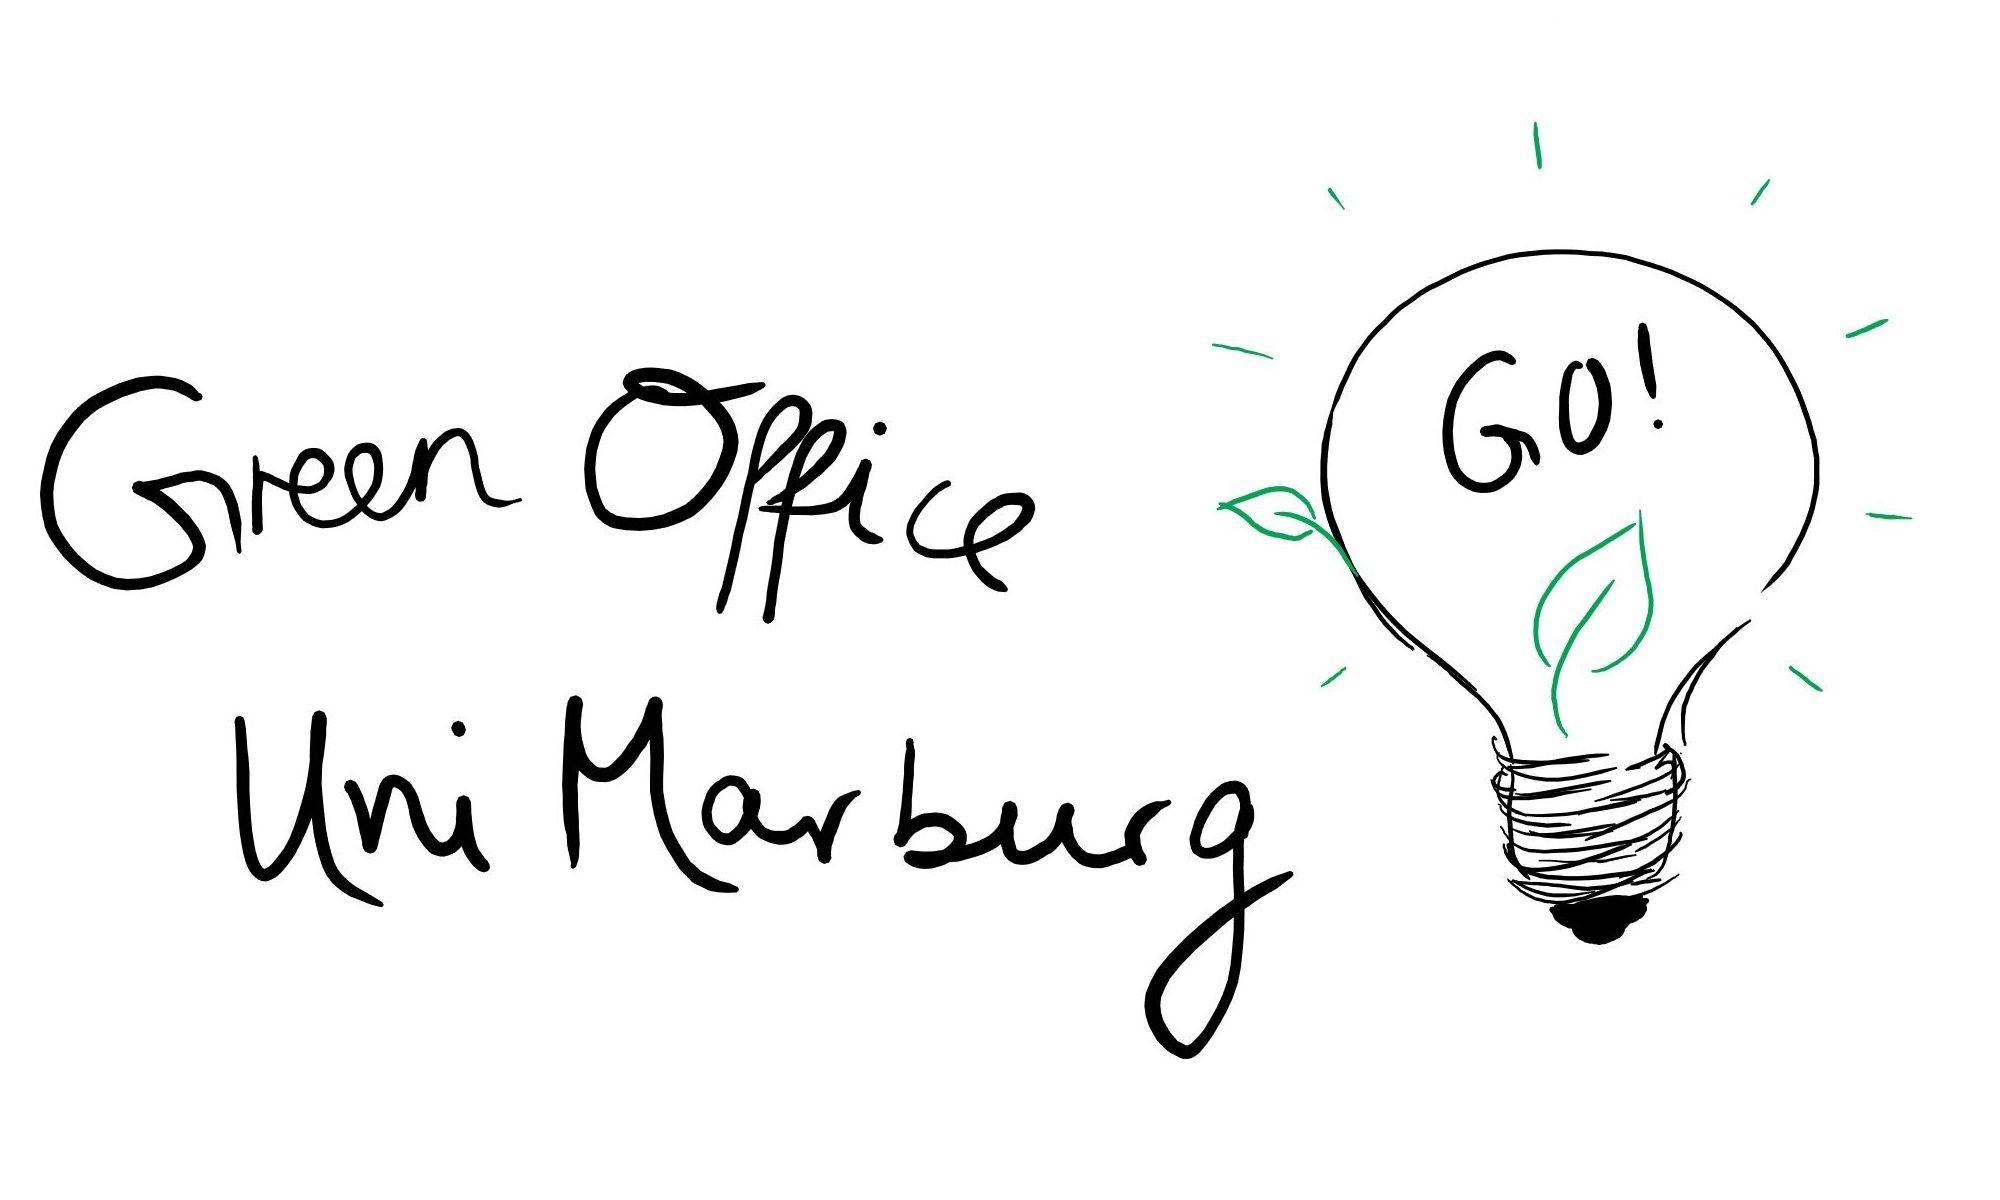 Green Office Uni Marburg